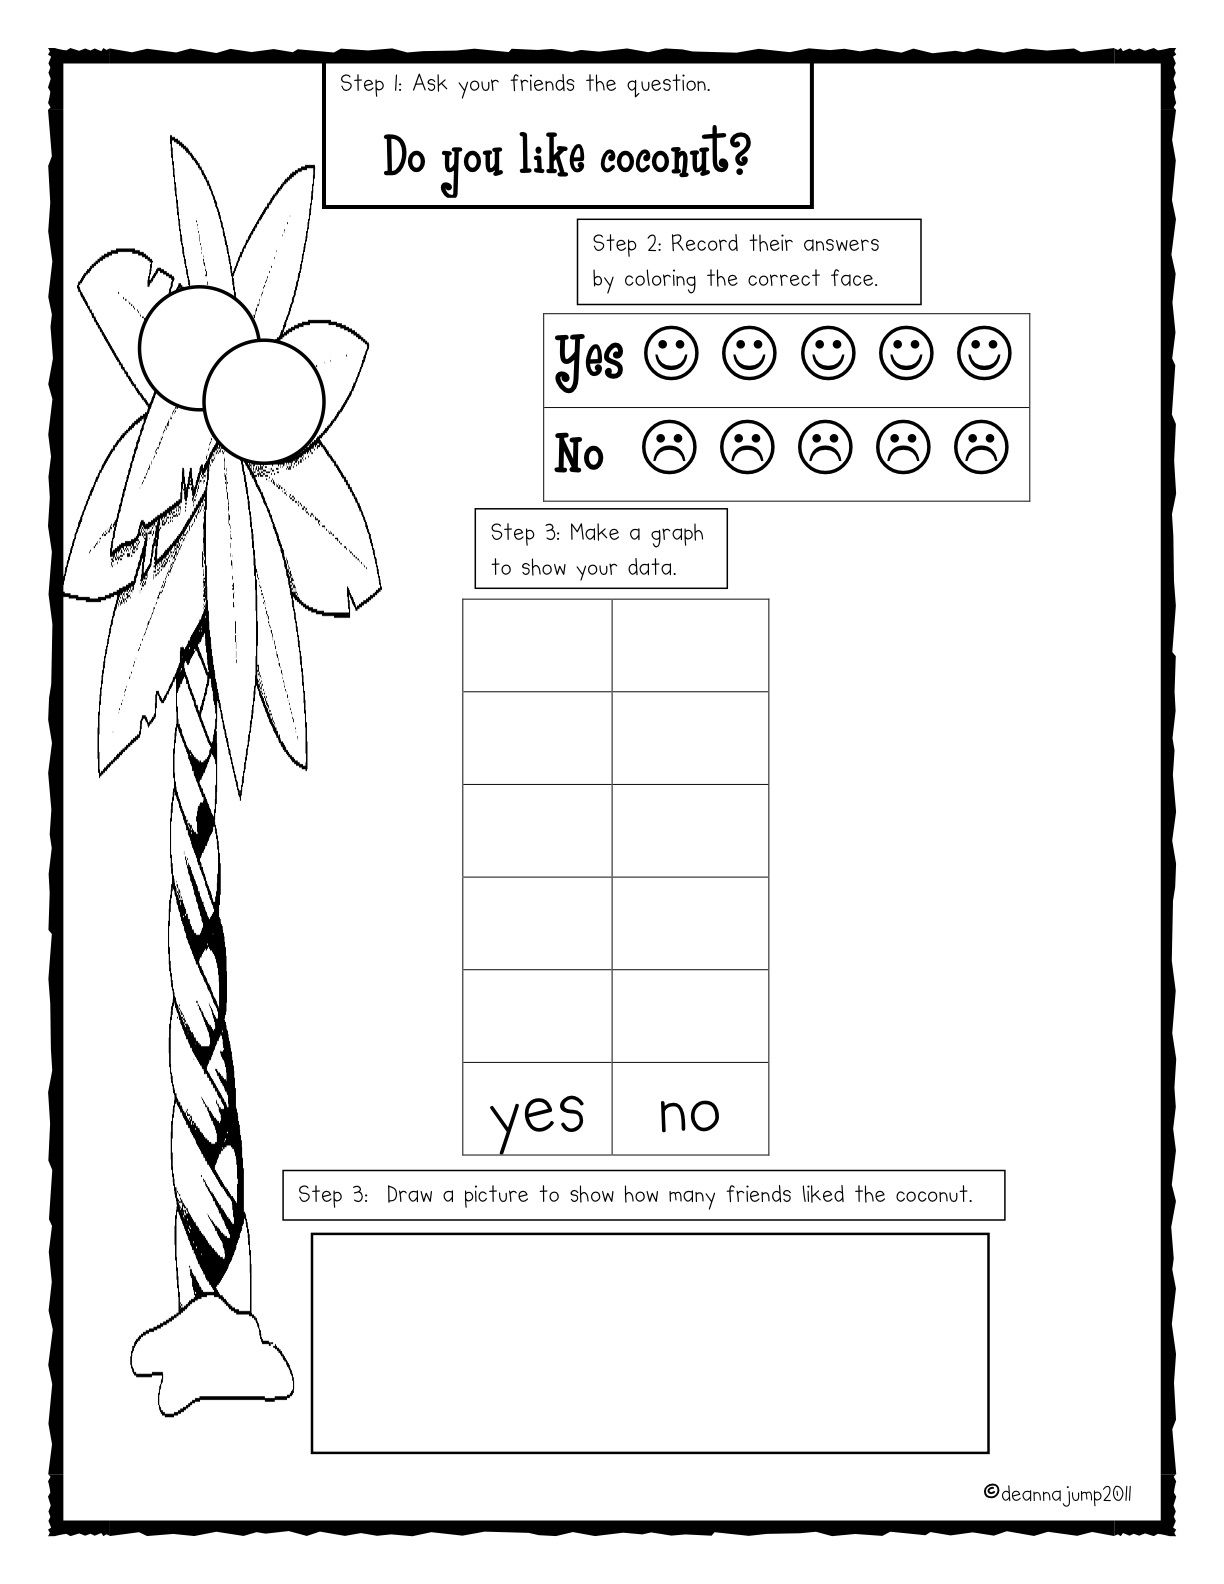 worksheet Kindergarten Graphing Worksheets graphing worksheet mrs kent pinterest worksheets kindergarten worksheet